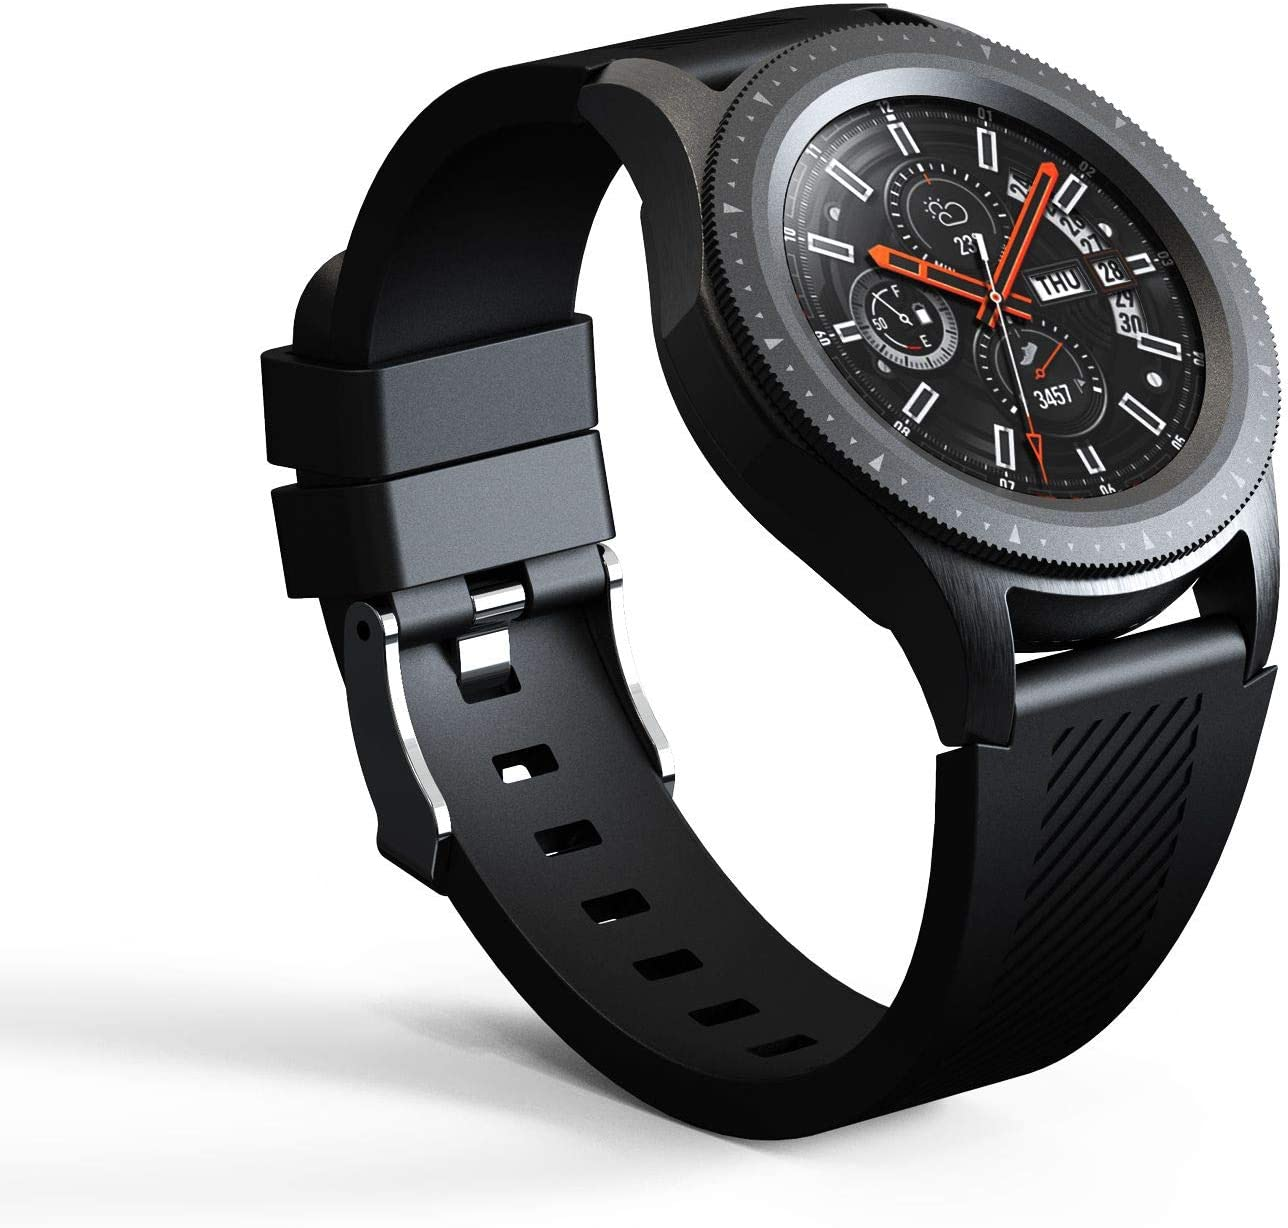 JIABAILE Smart Watch Nippon regular agency for Man Fitness Tracker wit Bracelets Sport Max 51% OFF